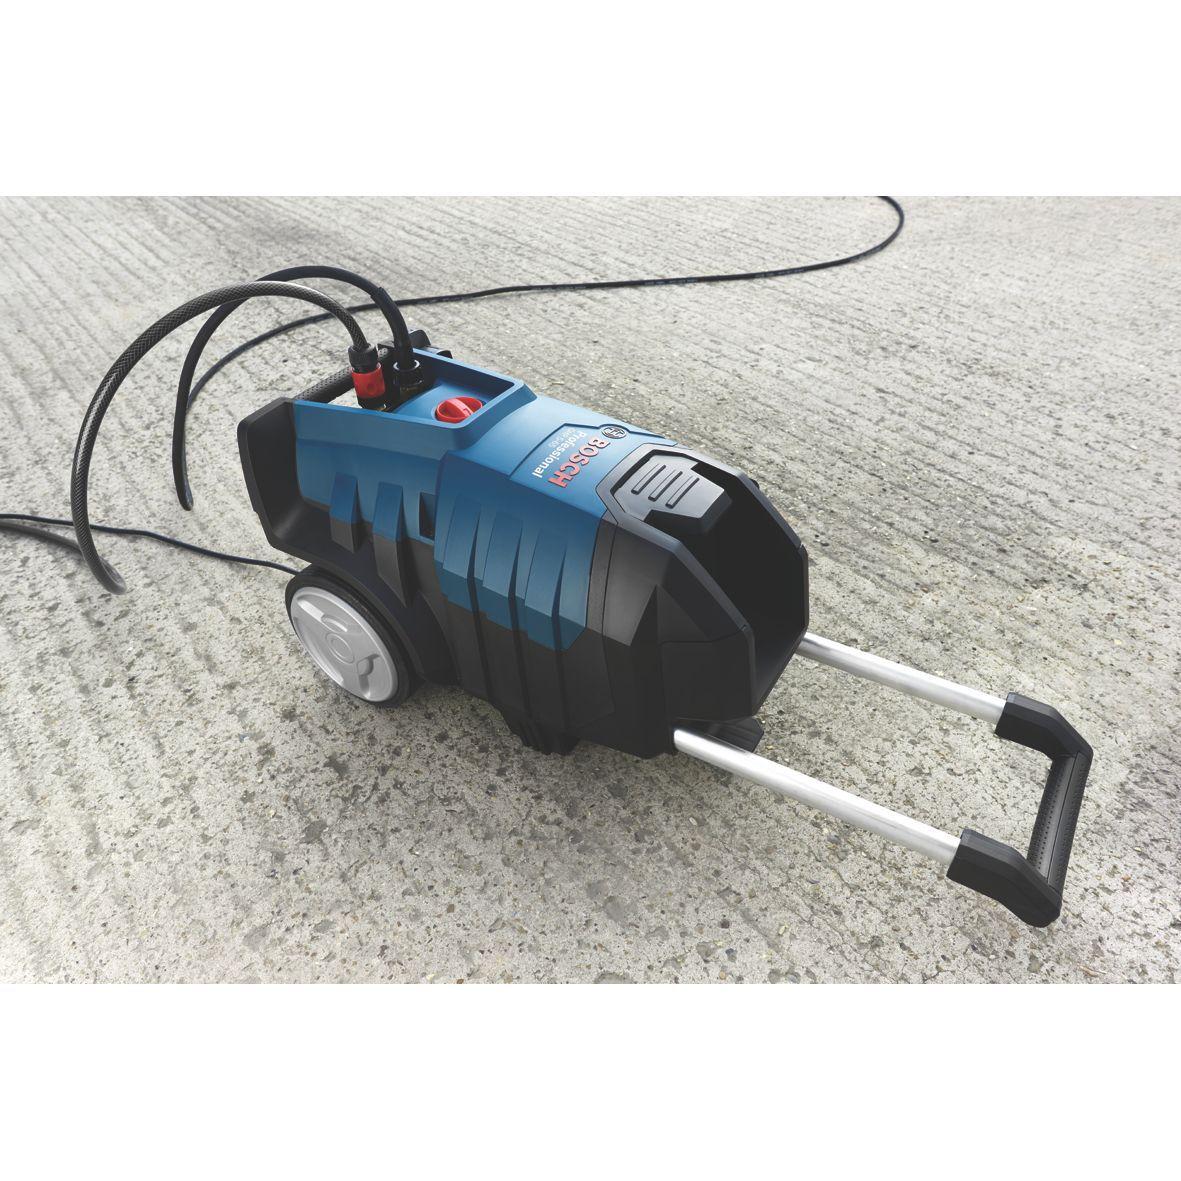 Bosch Ghp 5 65x 160bar Professional High Pressure Washer 2400w 220 240v Portable Water Tank Pressure Washer Accessories Storage